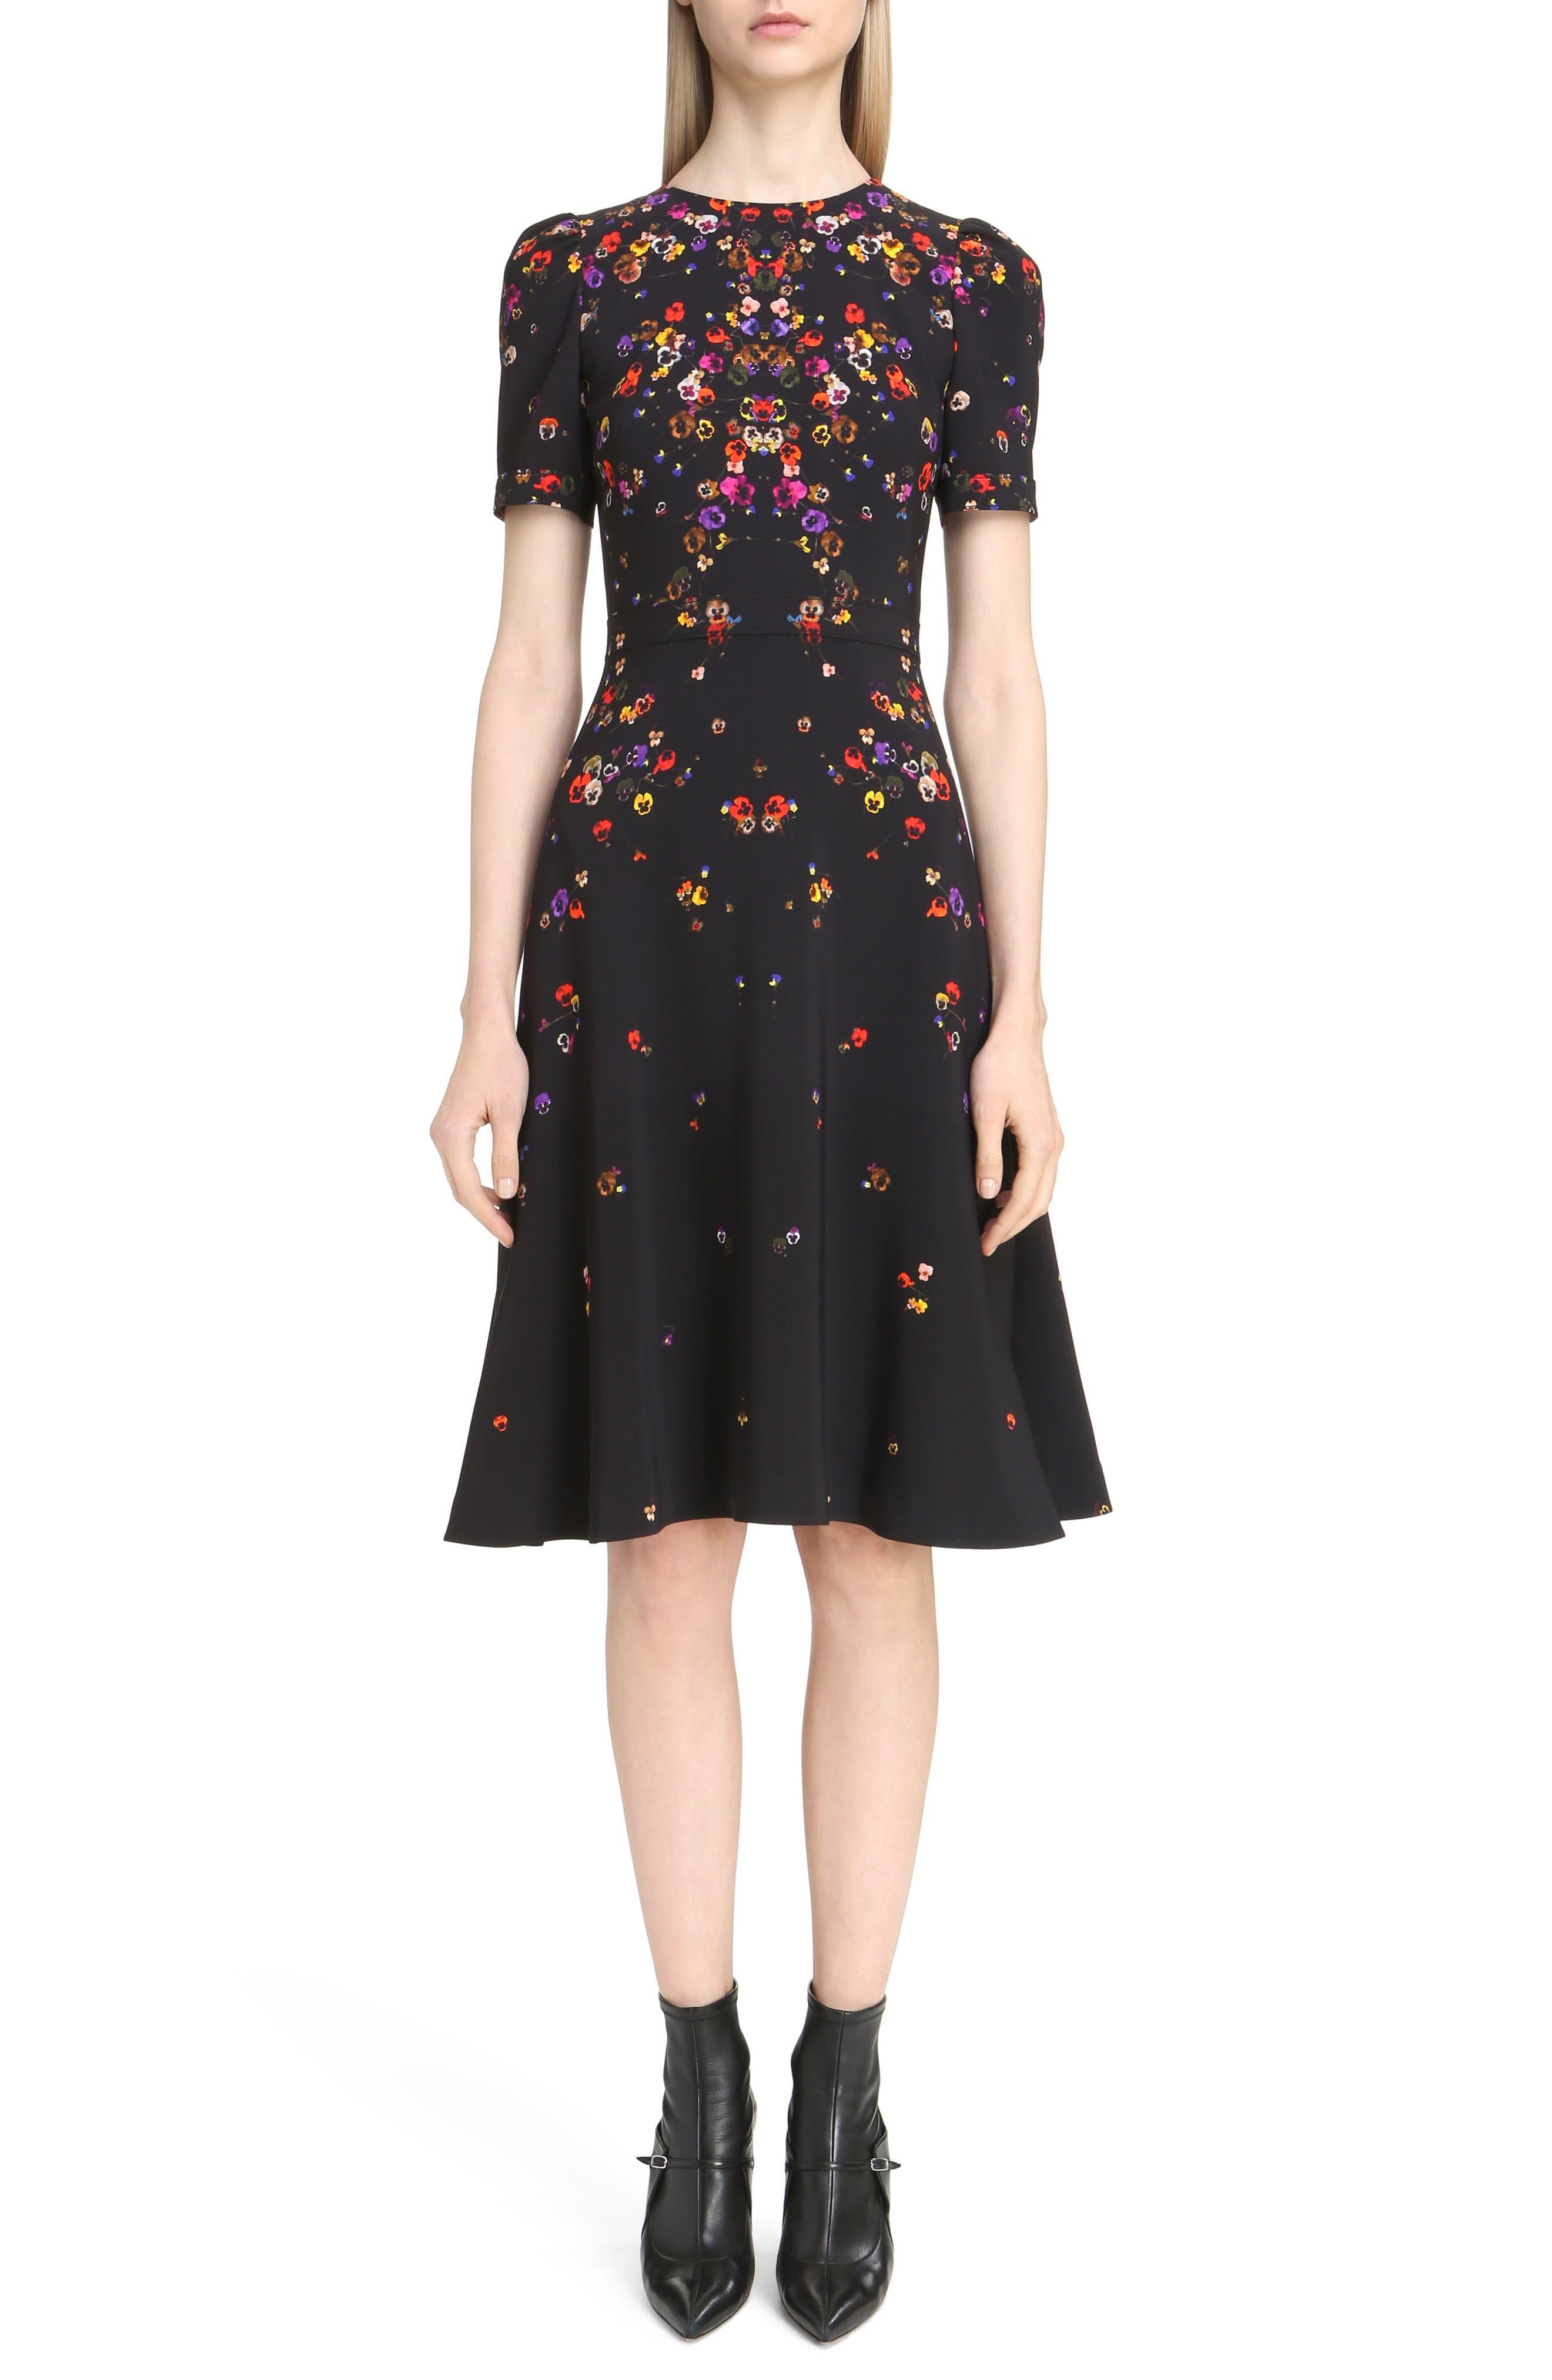 Alternate Image 1 Selected - Givenchy Pansy Print Stretch Cady Dress